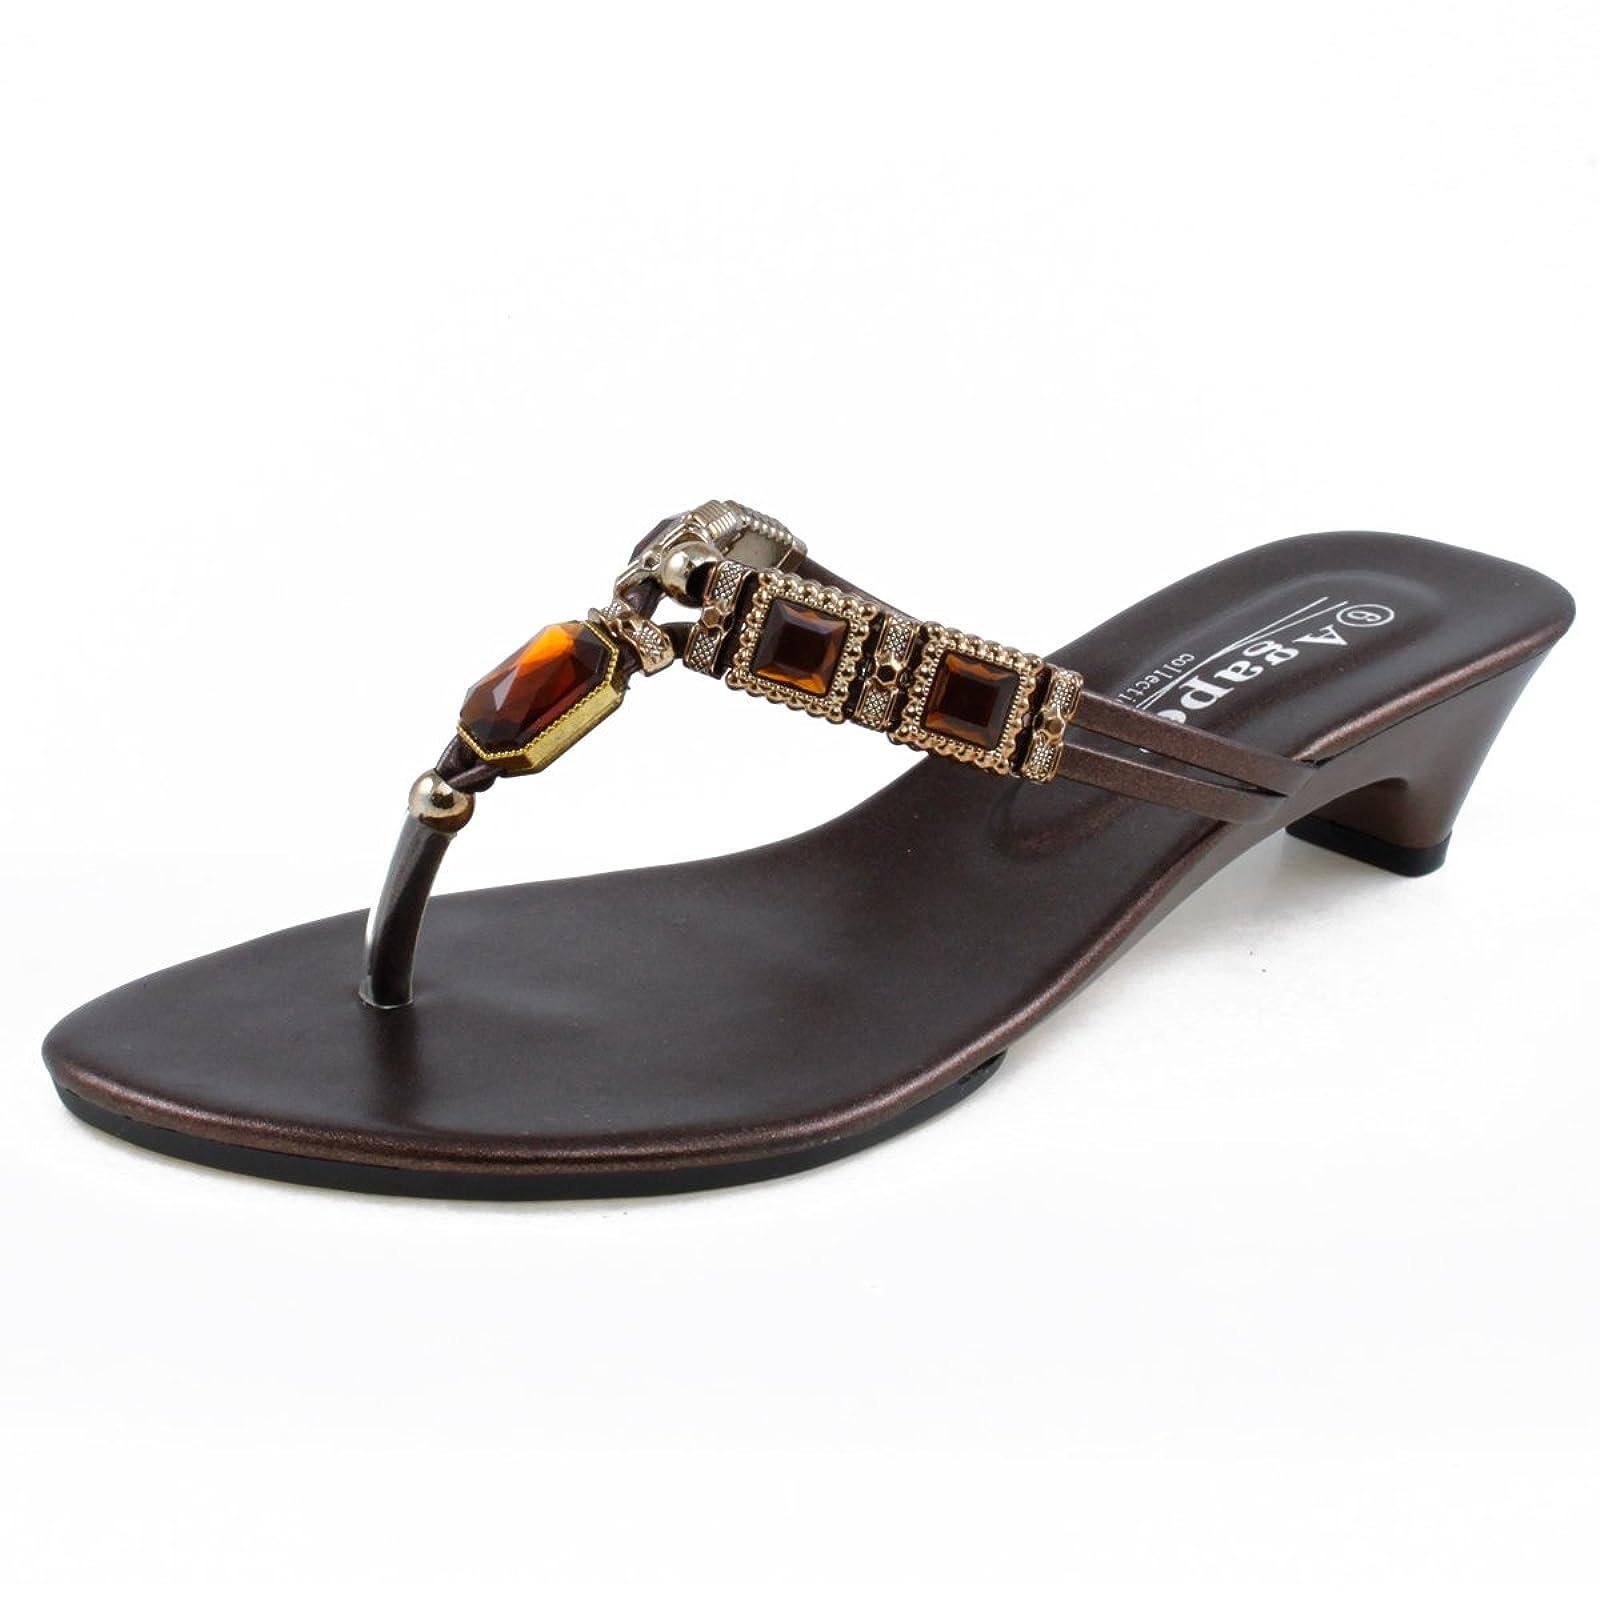 a33de00faf5 Agape VEGA-16 Jeweled Thong Low Heel Large - 1 ...